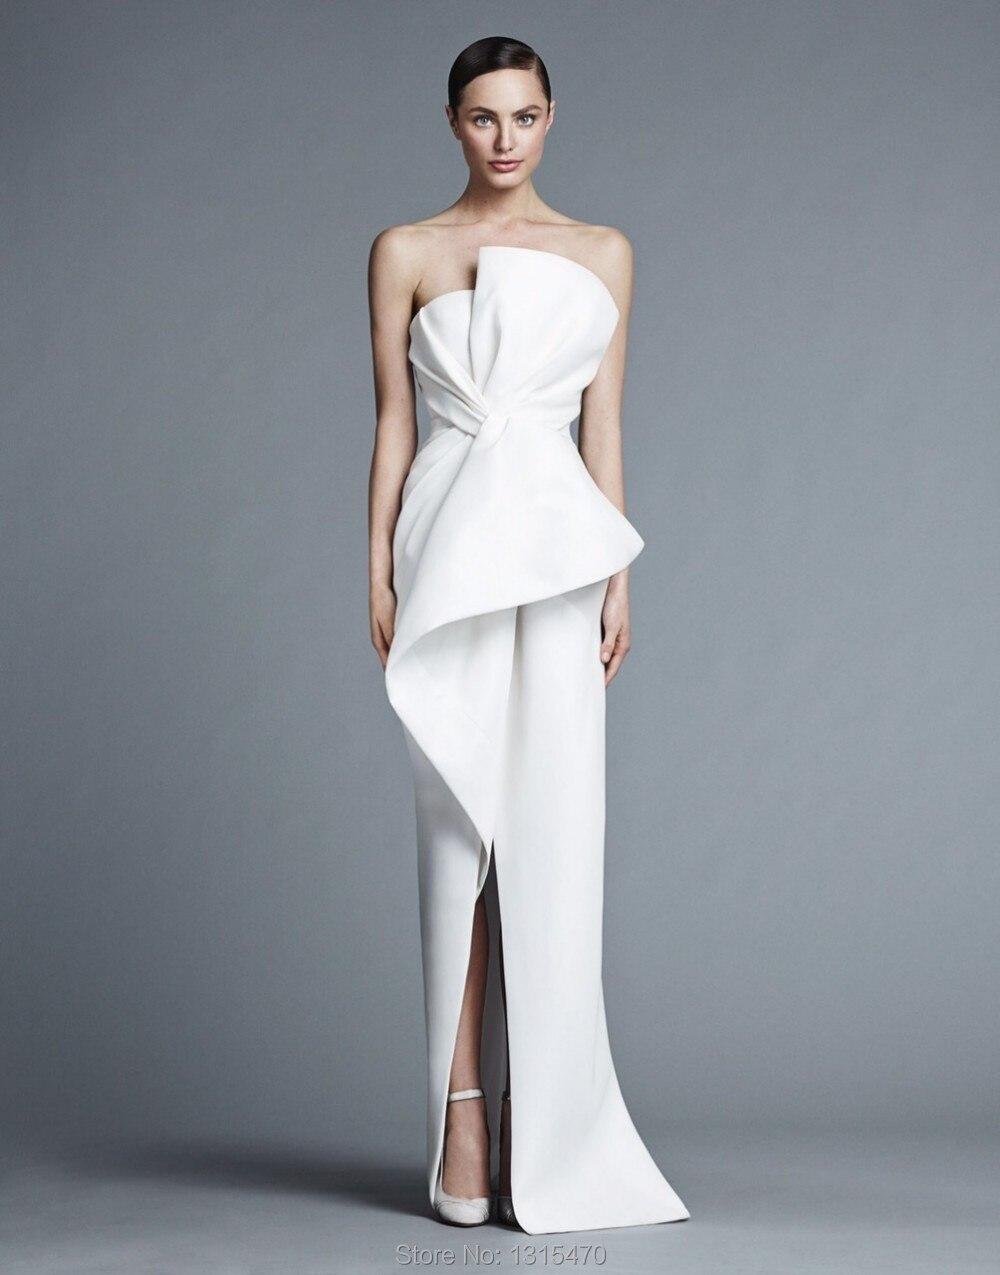 Online Get Cheap White Strapless Prom Dress -Aliexpress.com ...